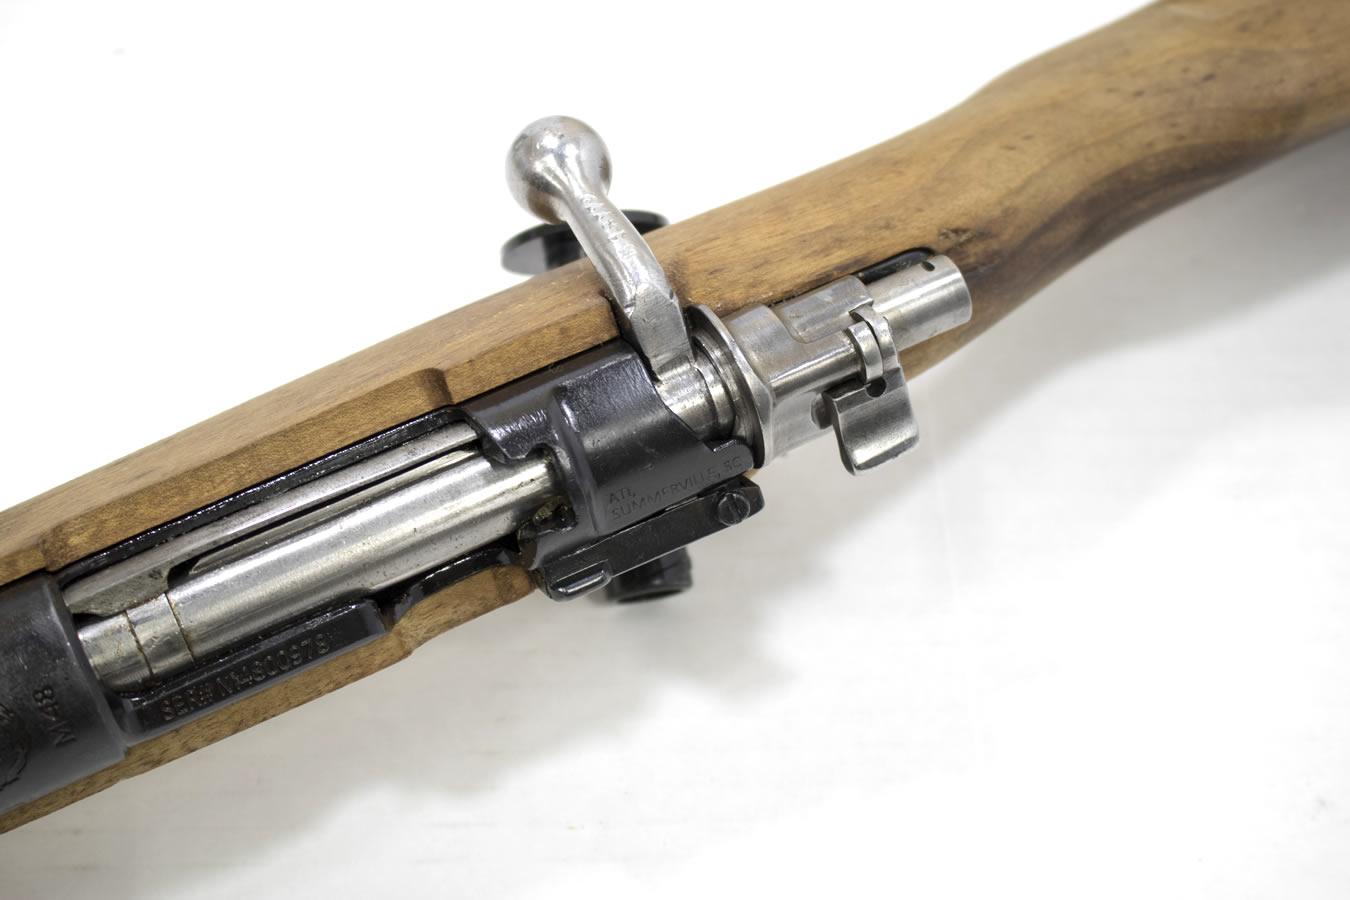 Yugo M48 7 9x57mm Mauser Rifle (Excellent Condition)